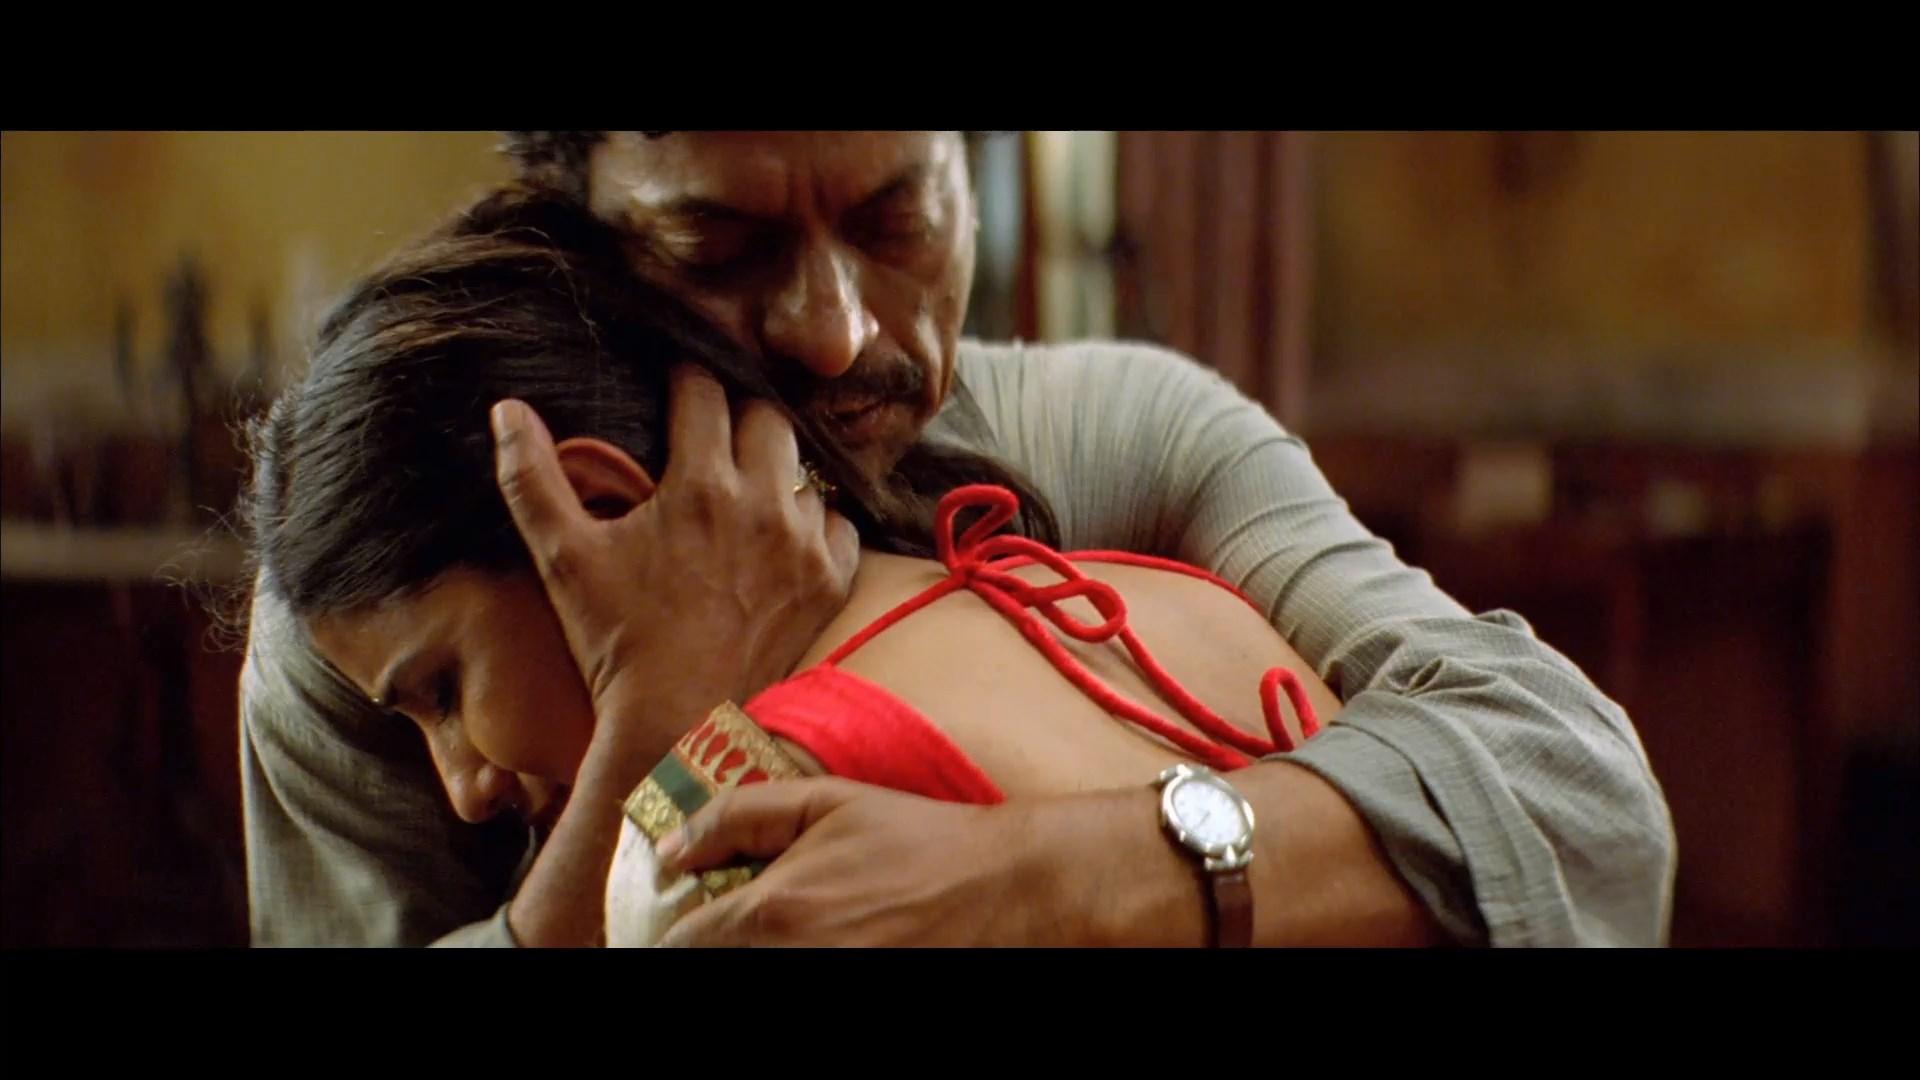 Ekla Akash 2012 Bengali 1080P WEBDL x264 AVC AAC [shadow].mp4 snapshot 01.08.33.783